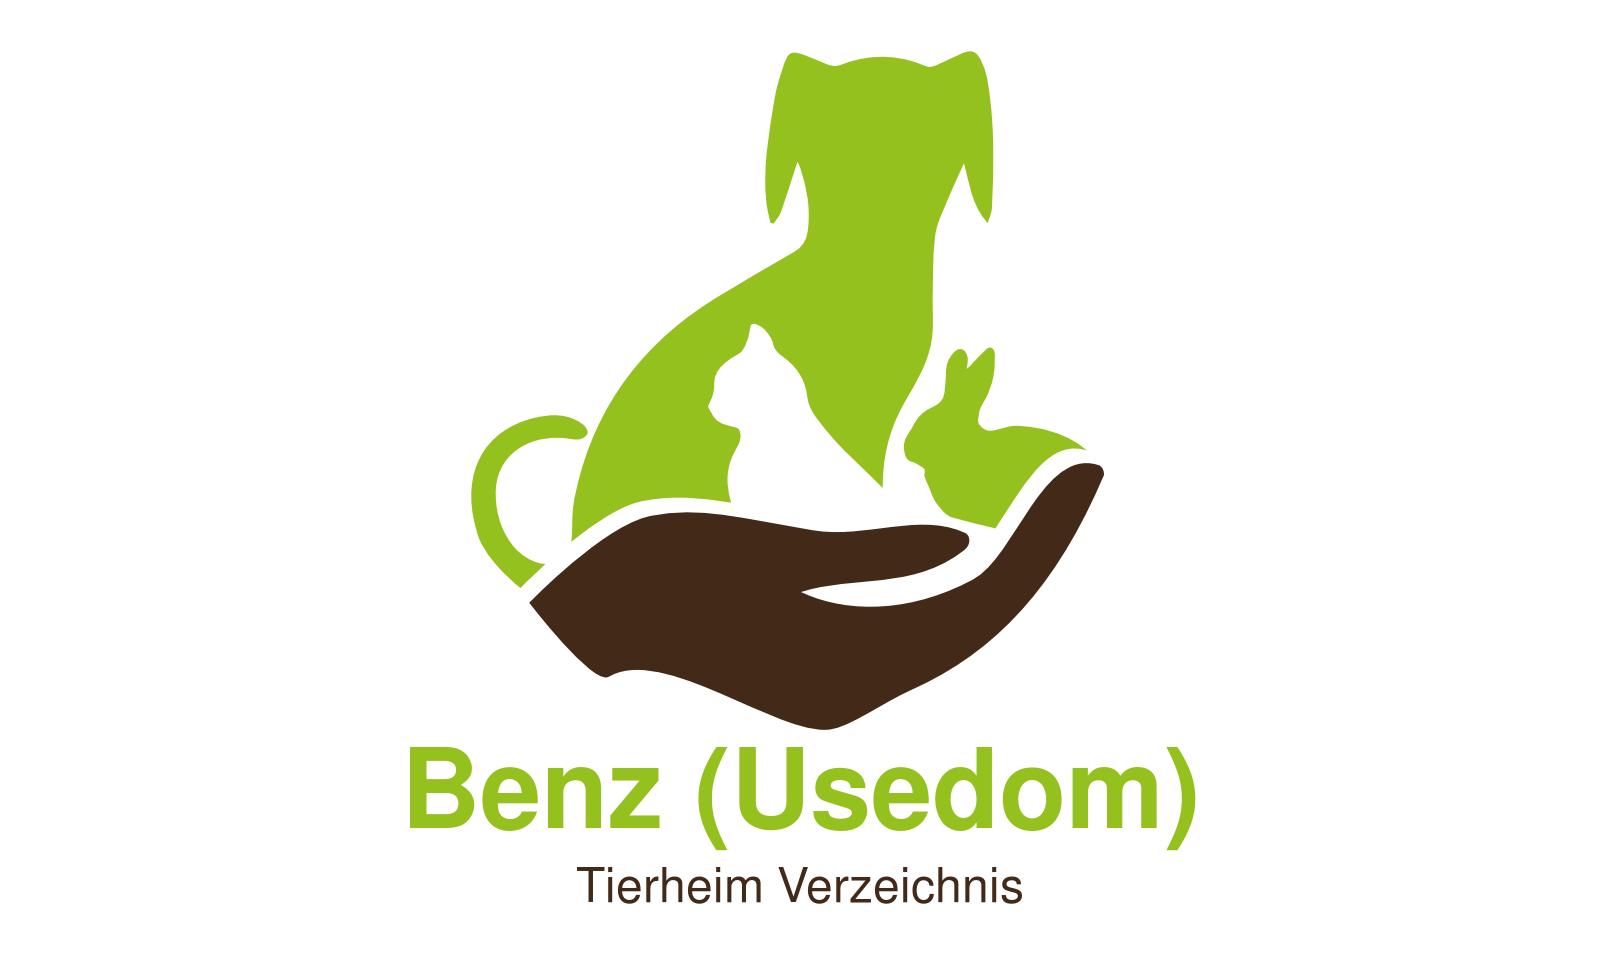 Tierheim Benz (Usedom)